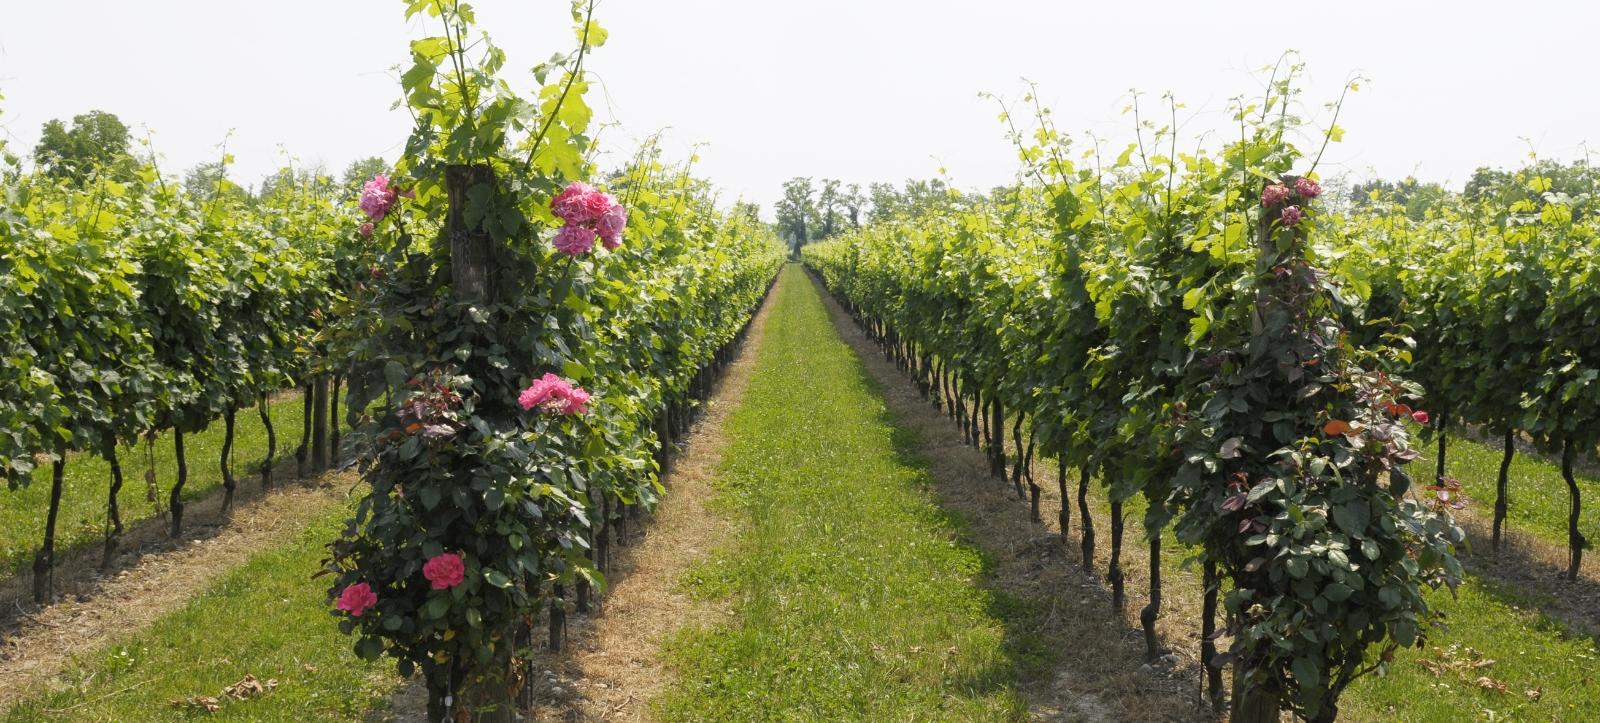 vineyard_friuli_2